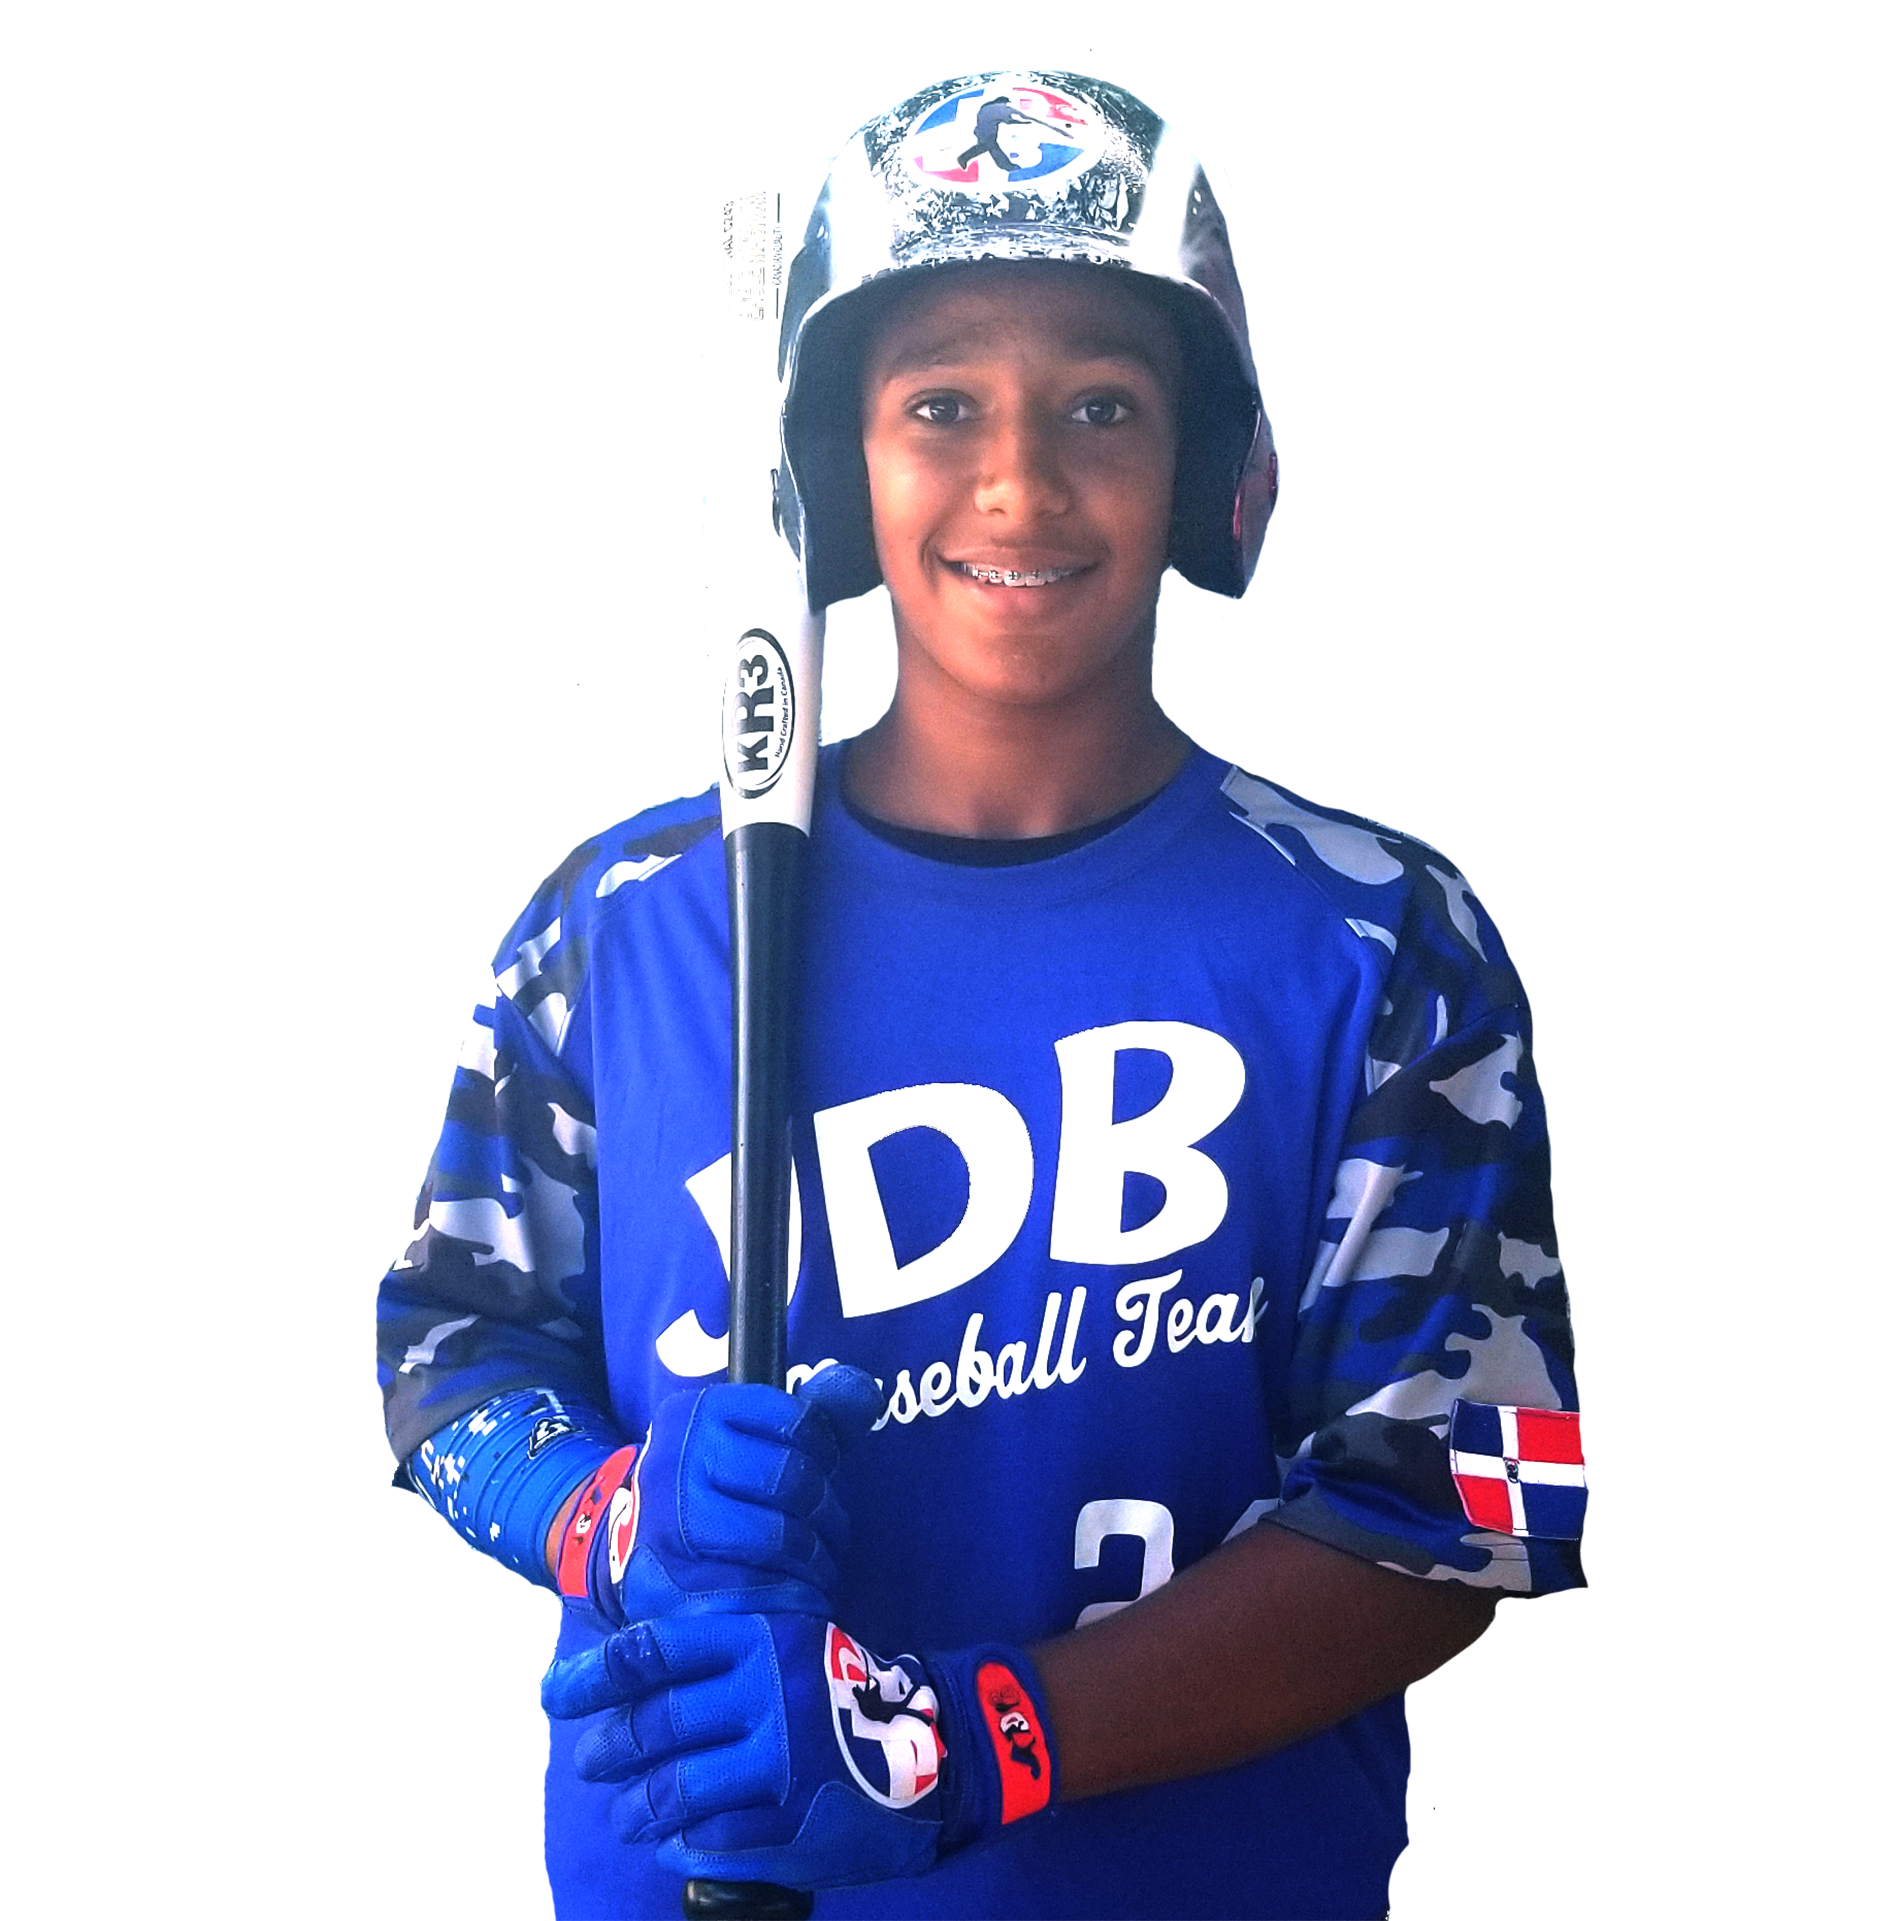 JDB   JDB Baseball RD   República Dominicana